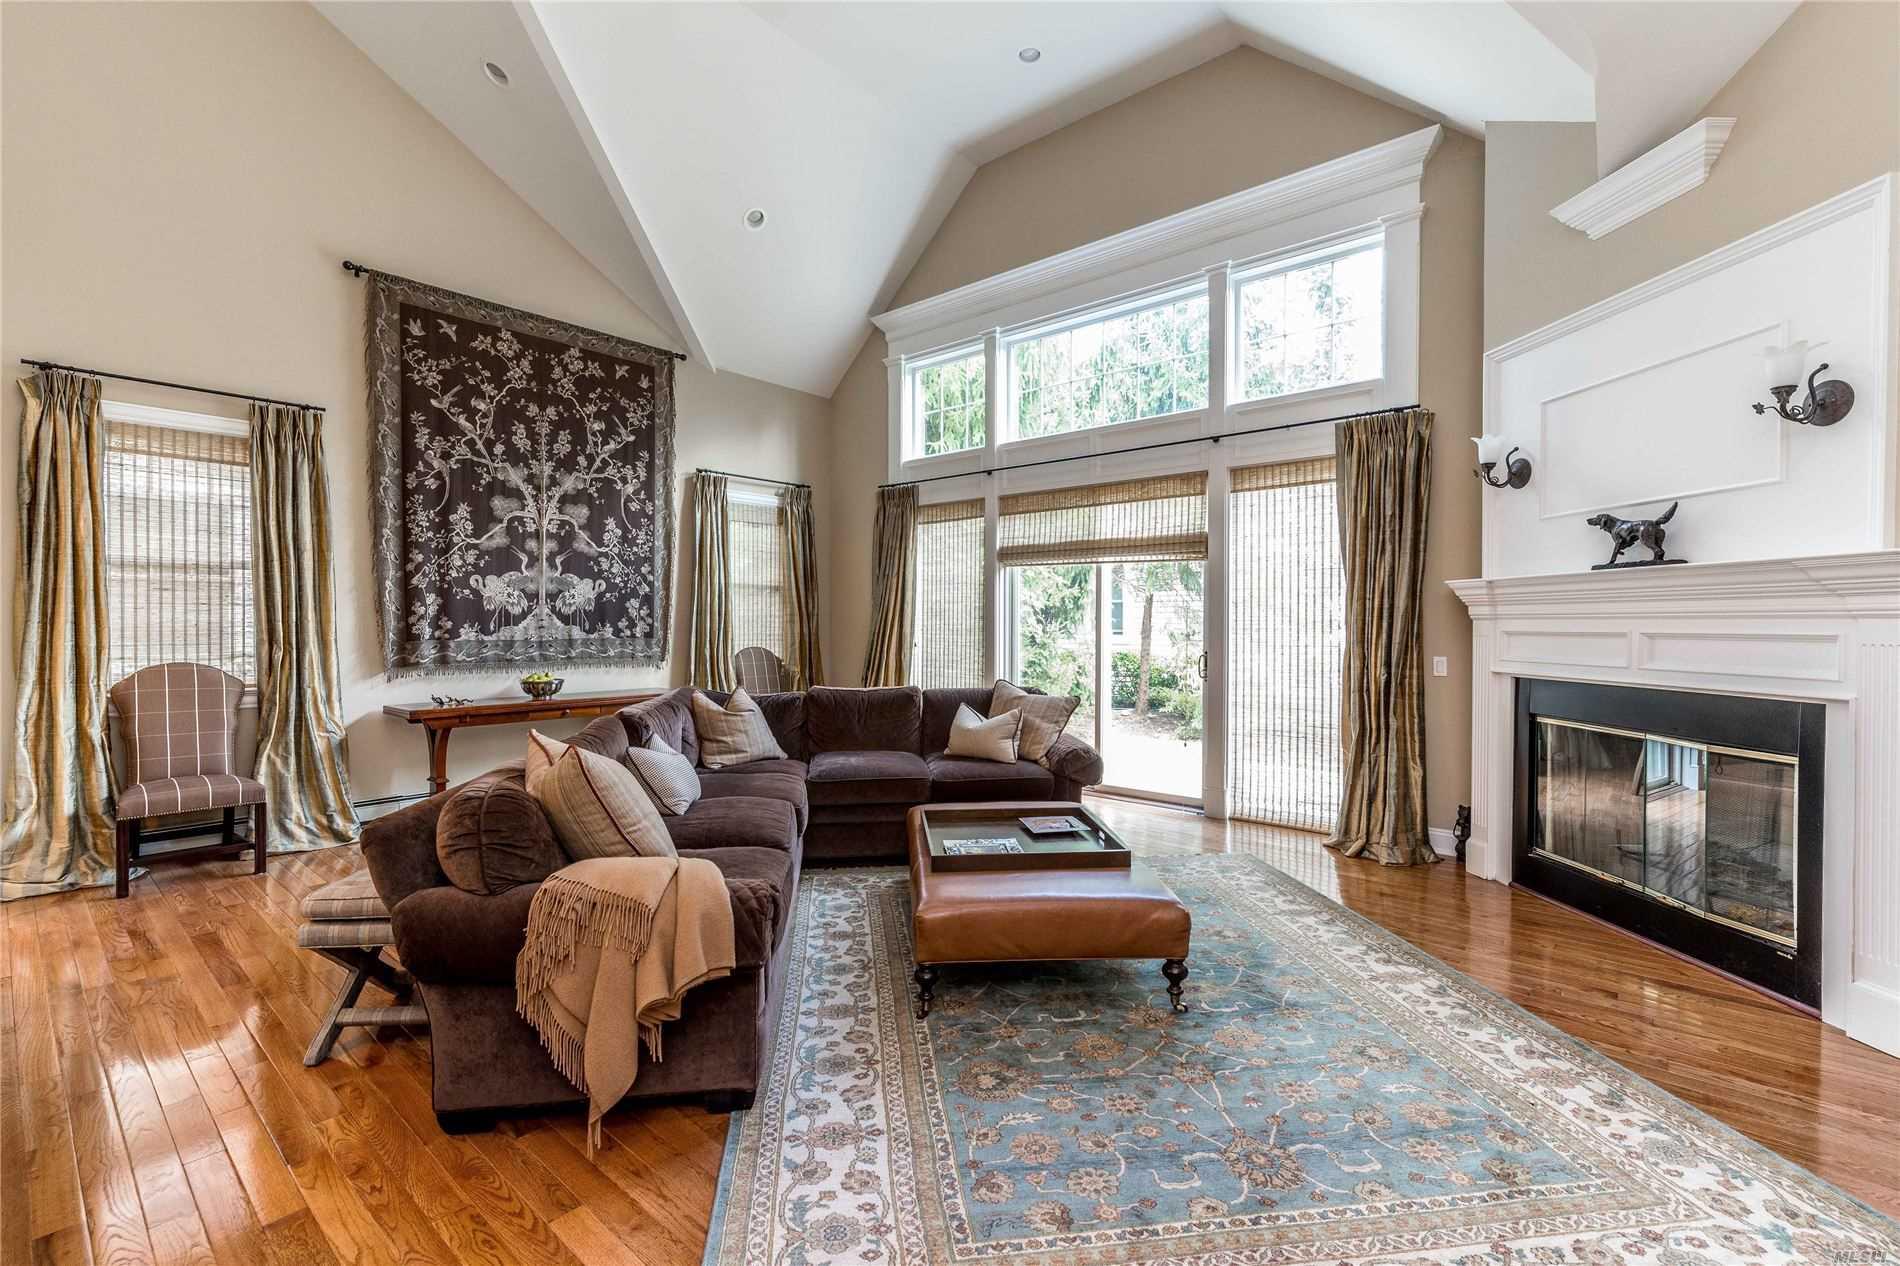 Property for sale at 30 W Overlook, Port Washington NY 11050, Port Washington,  New York 11050